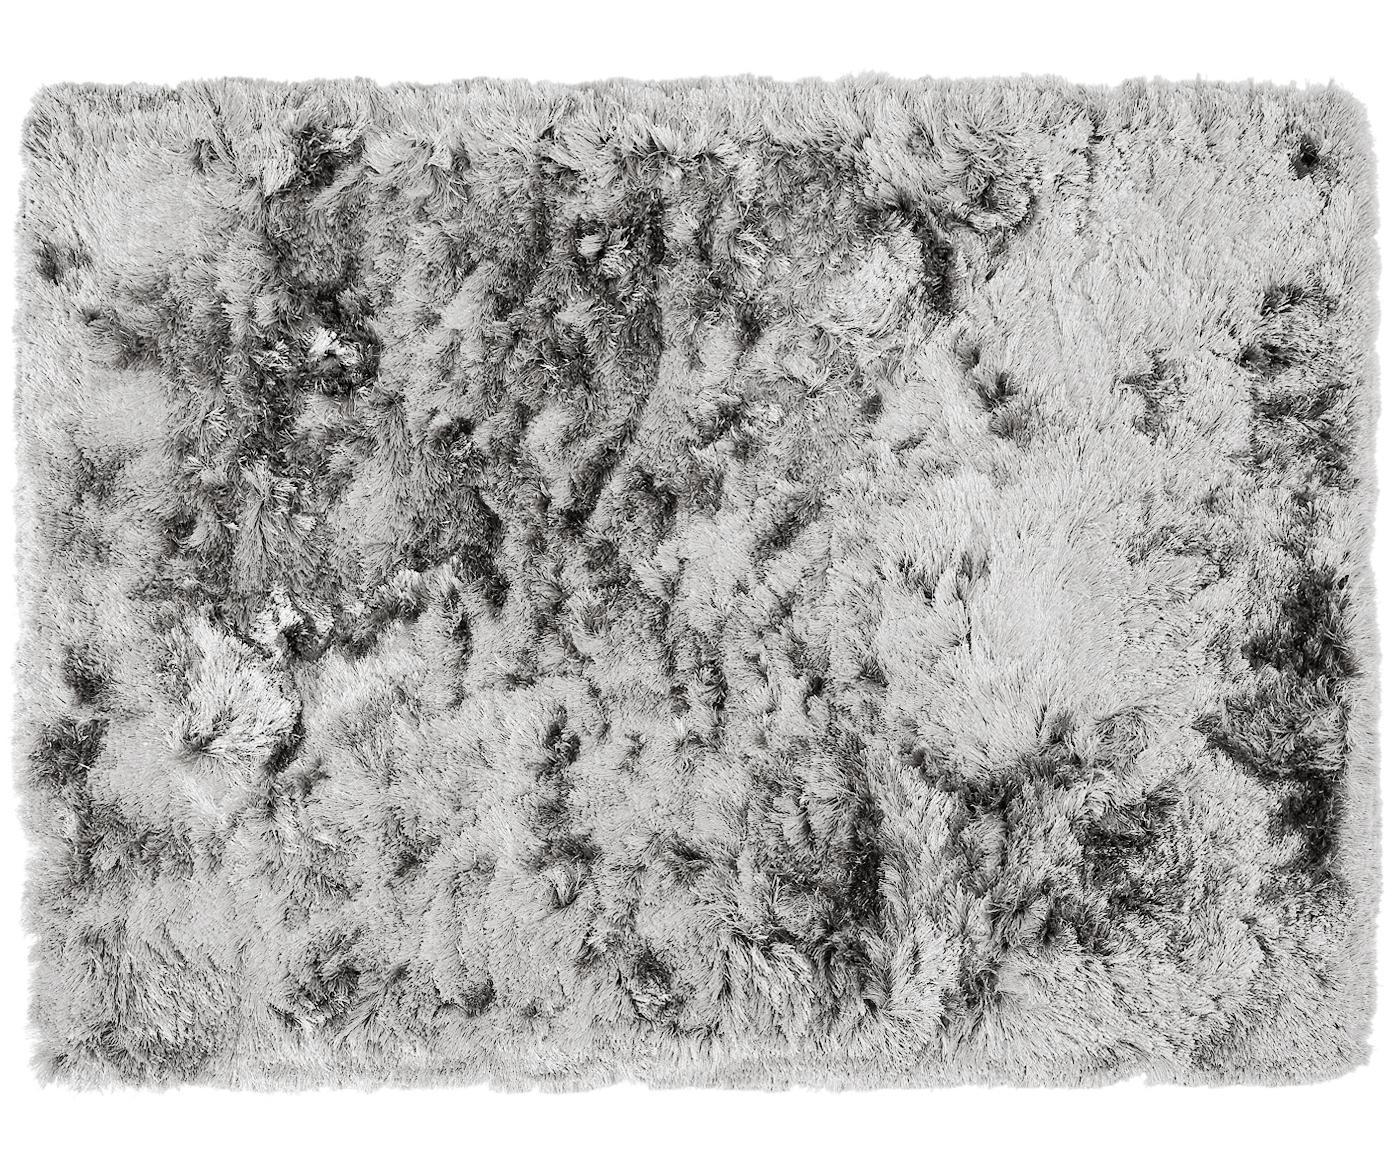 Glänzender Hochflor-Teppich Jimmy in Hellgrau, Flor: 100% Polyester, Hellgrau, B 120 x L 180 cm (Grösse S)